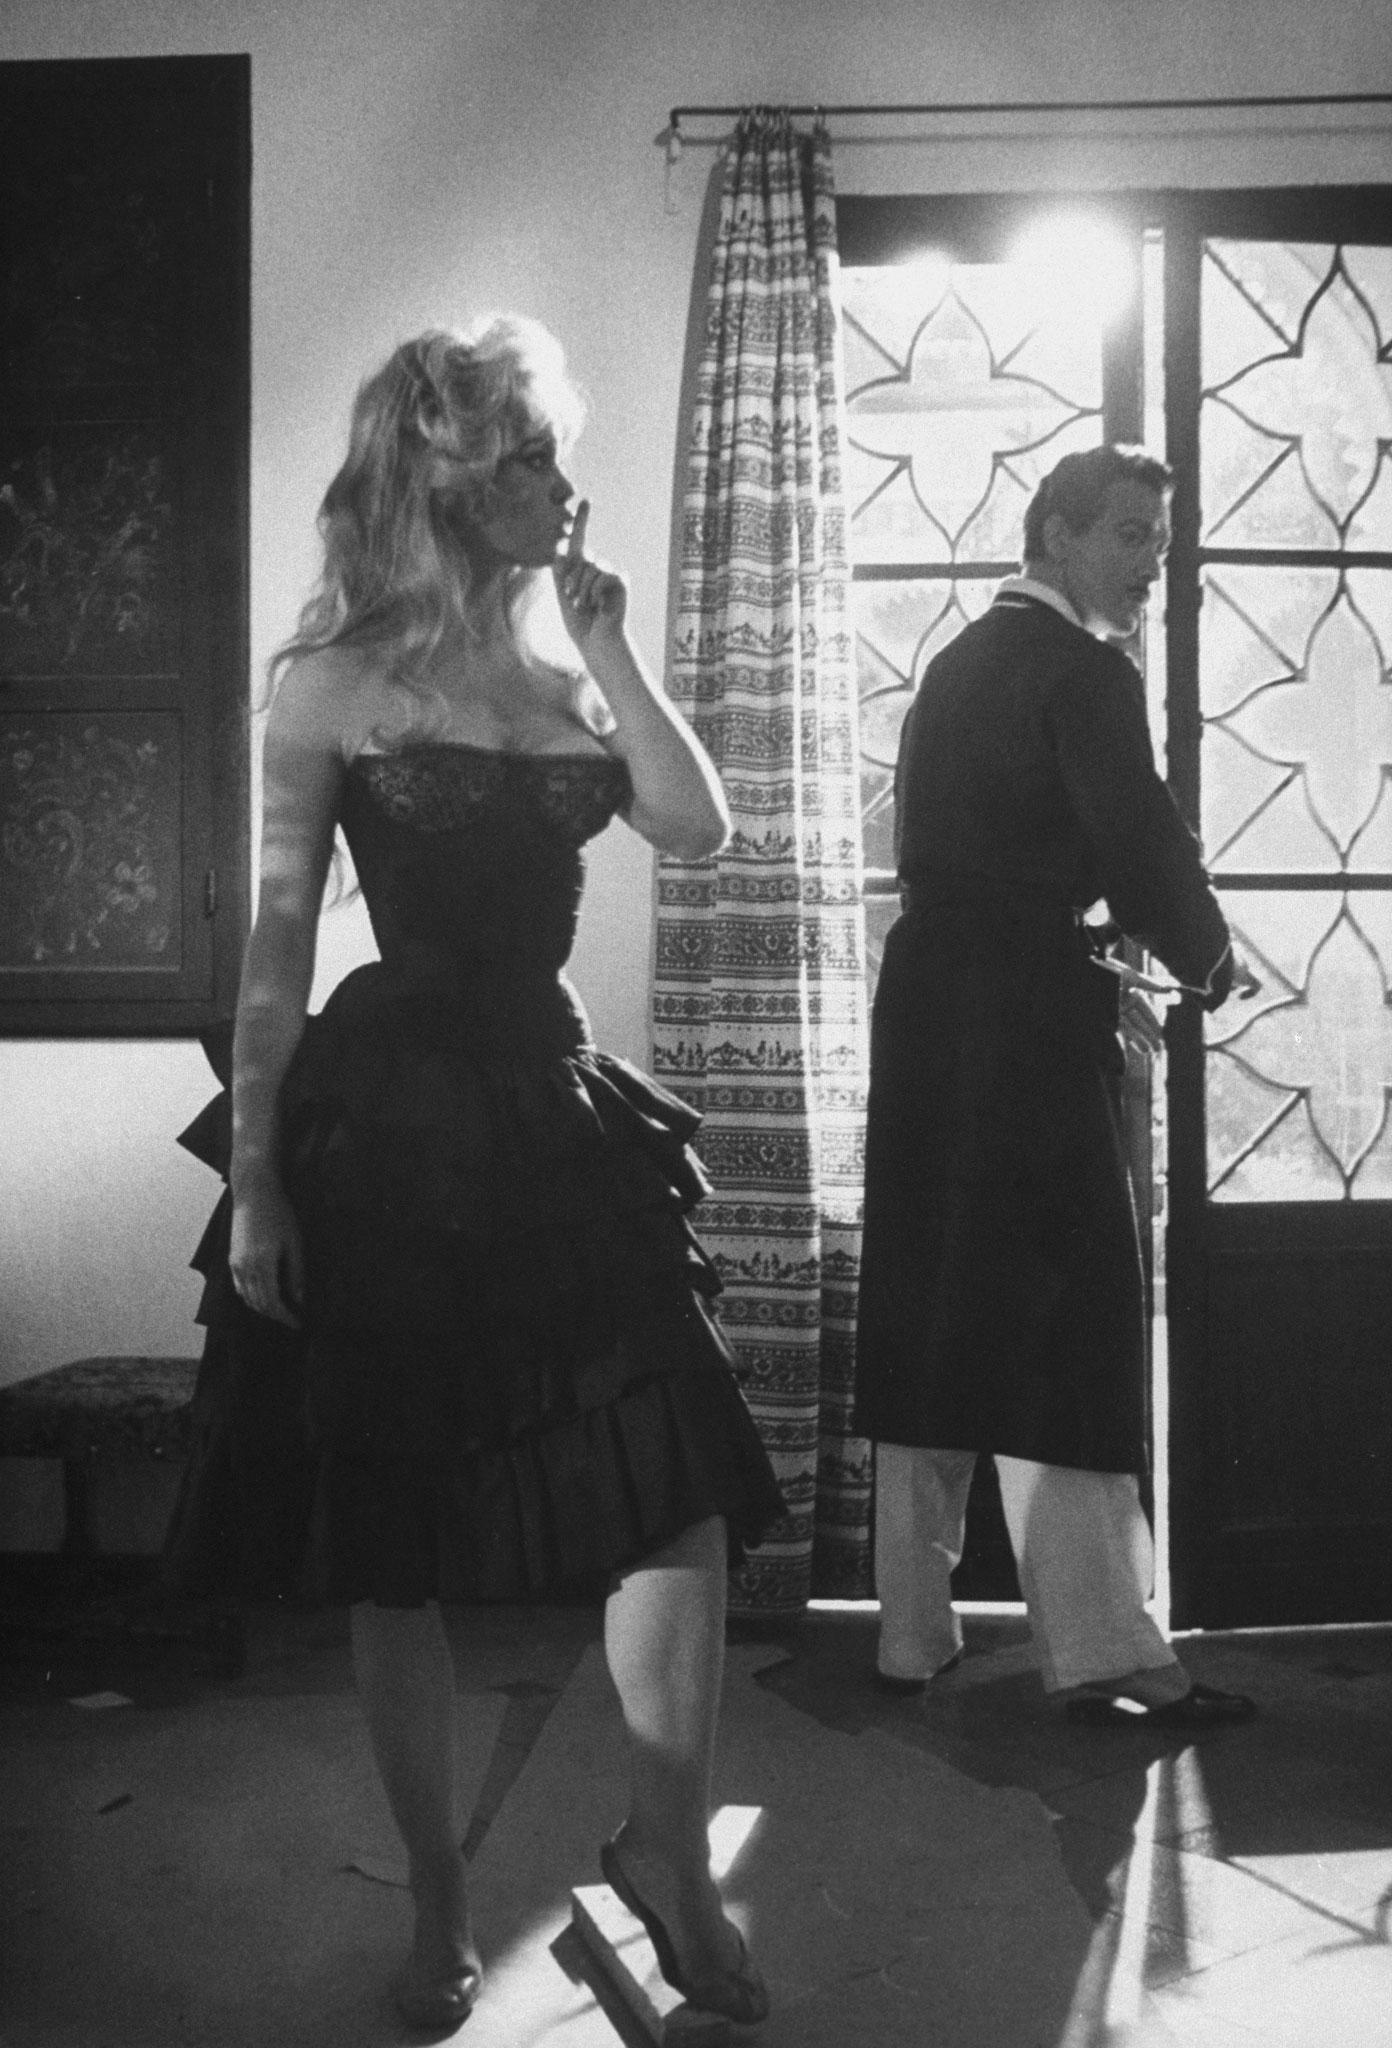 Brigitte Bardot with co-star Antonio Vilar on the set of the film, <i>La Femme et le Pantin</i>, Spain, 1958.